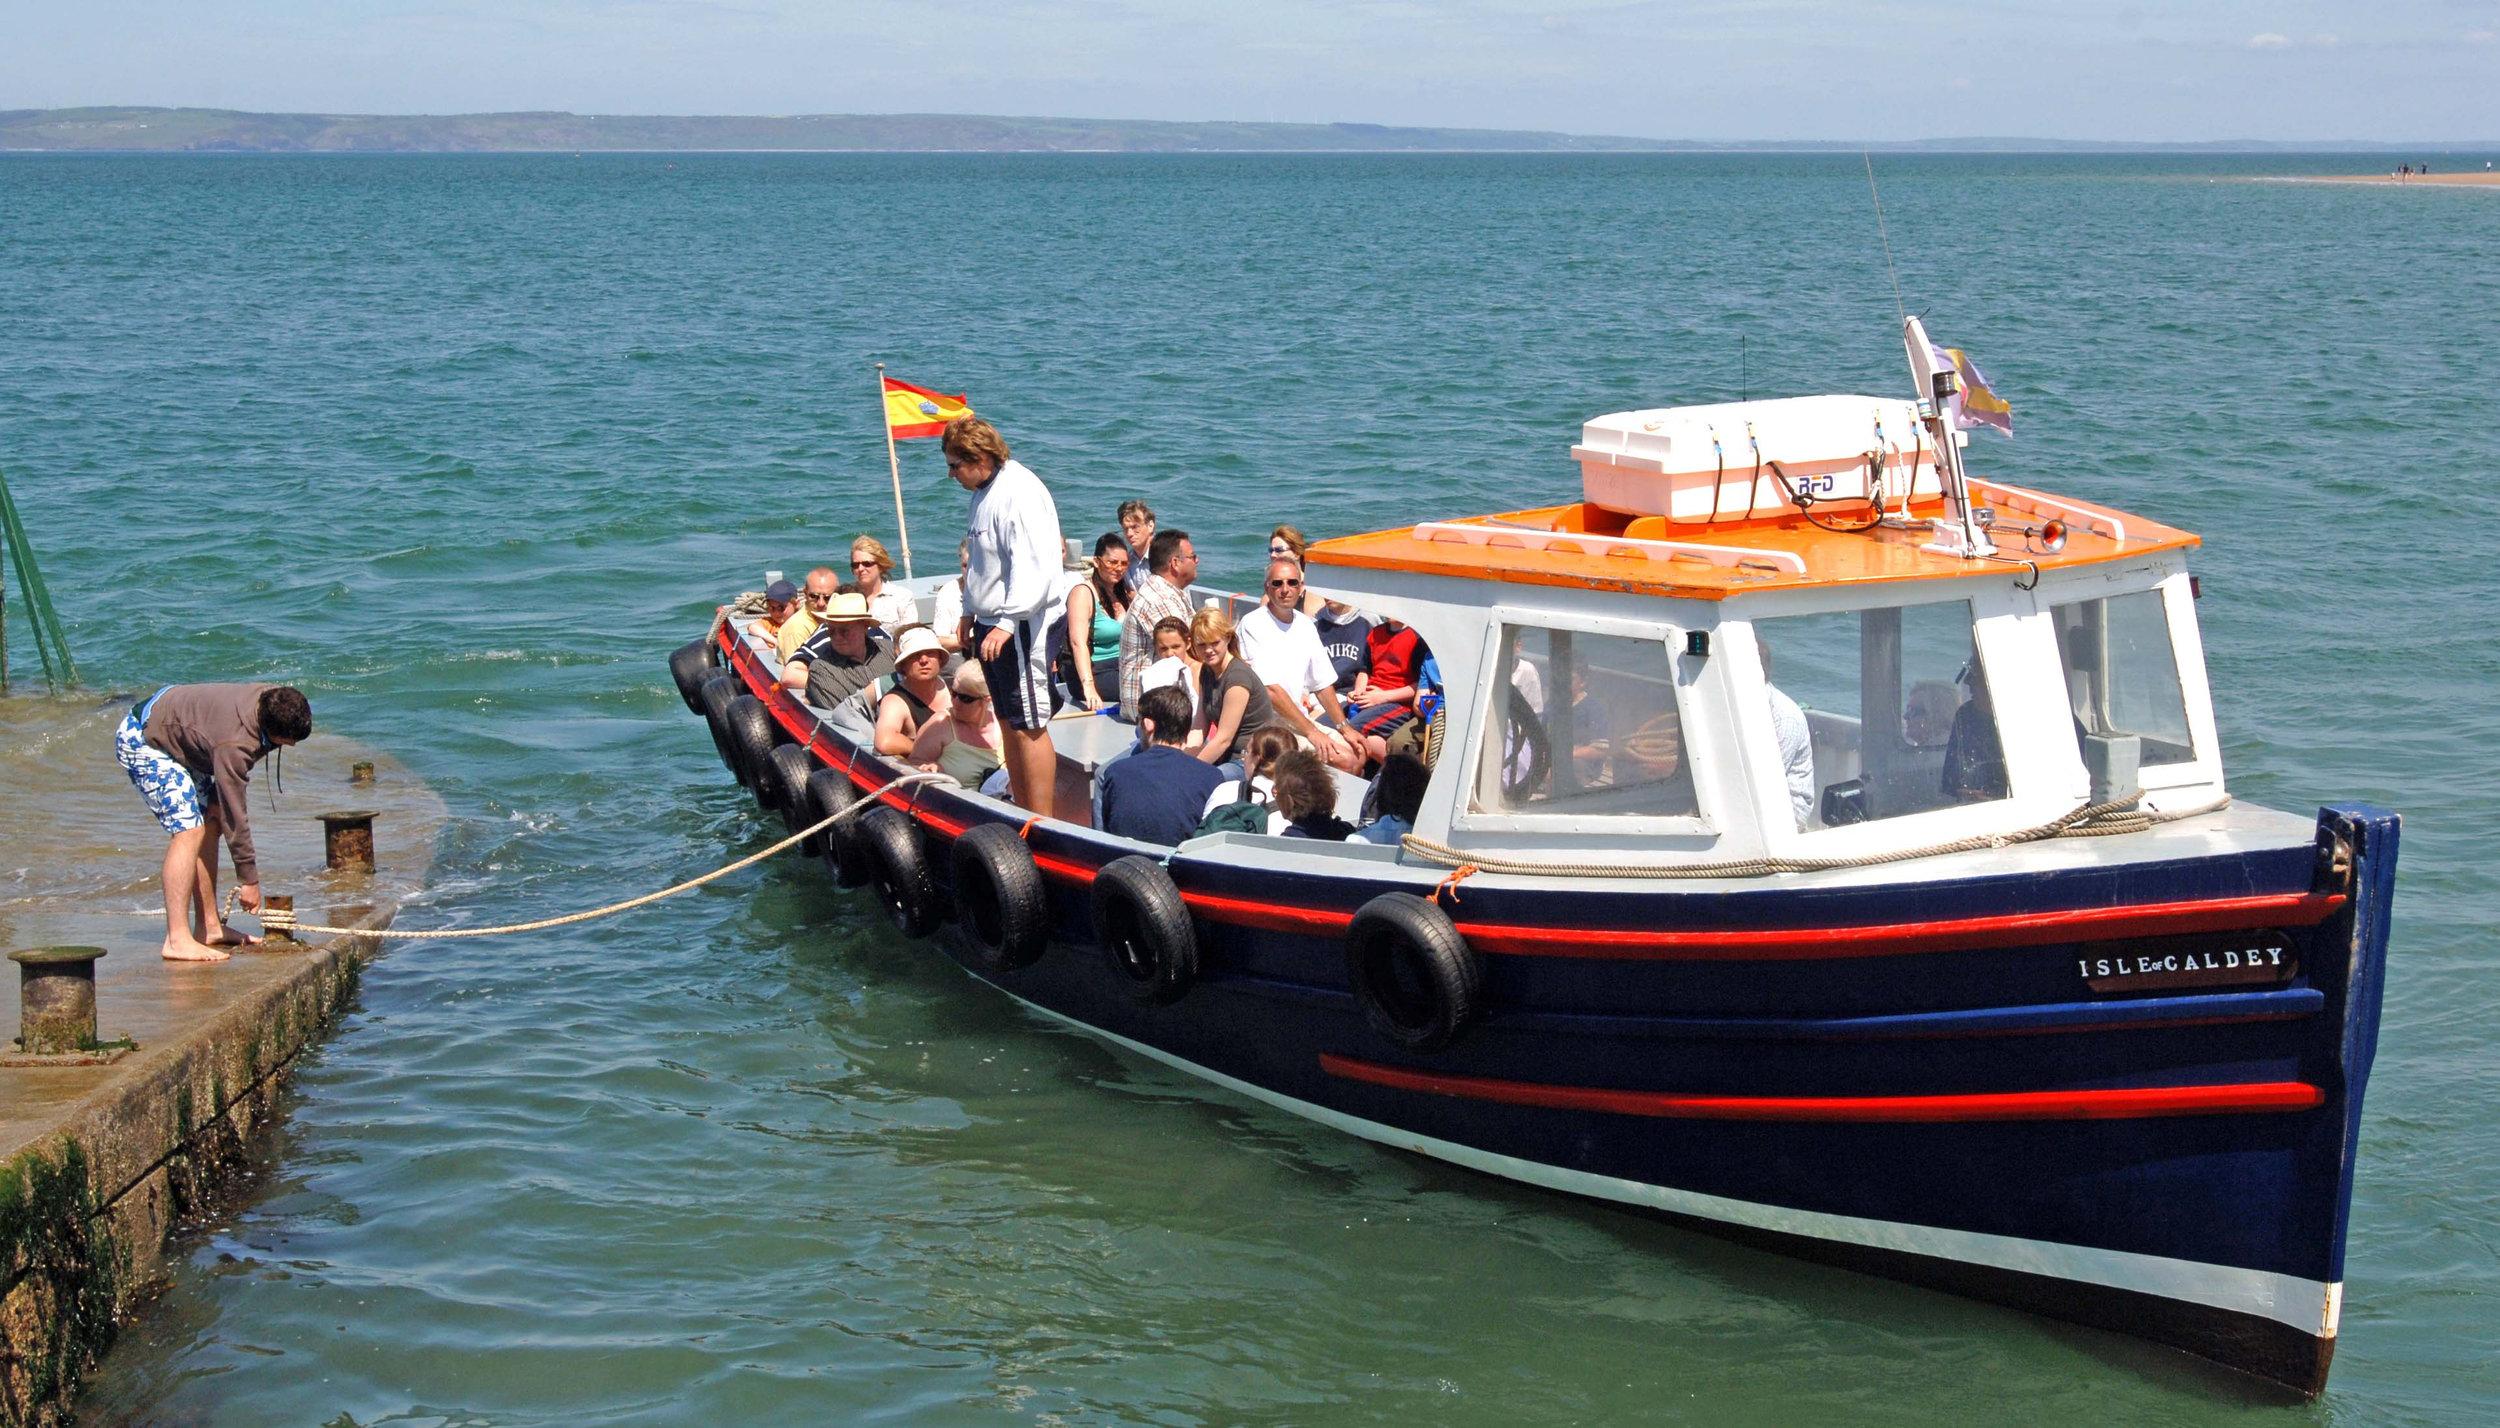 Caldey Boat landing 2.jpg